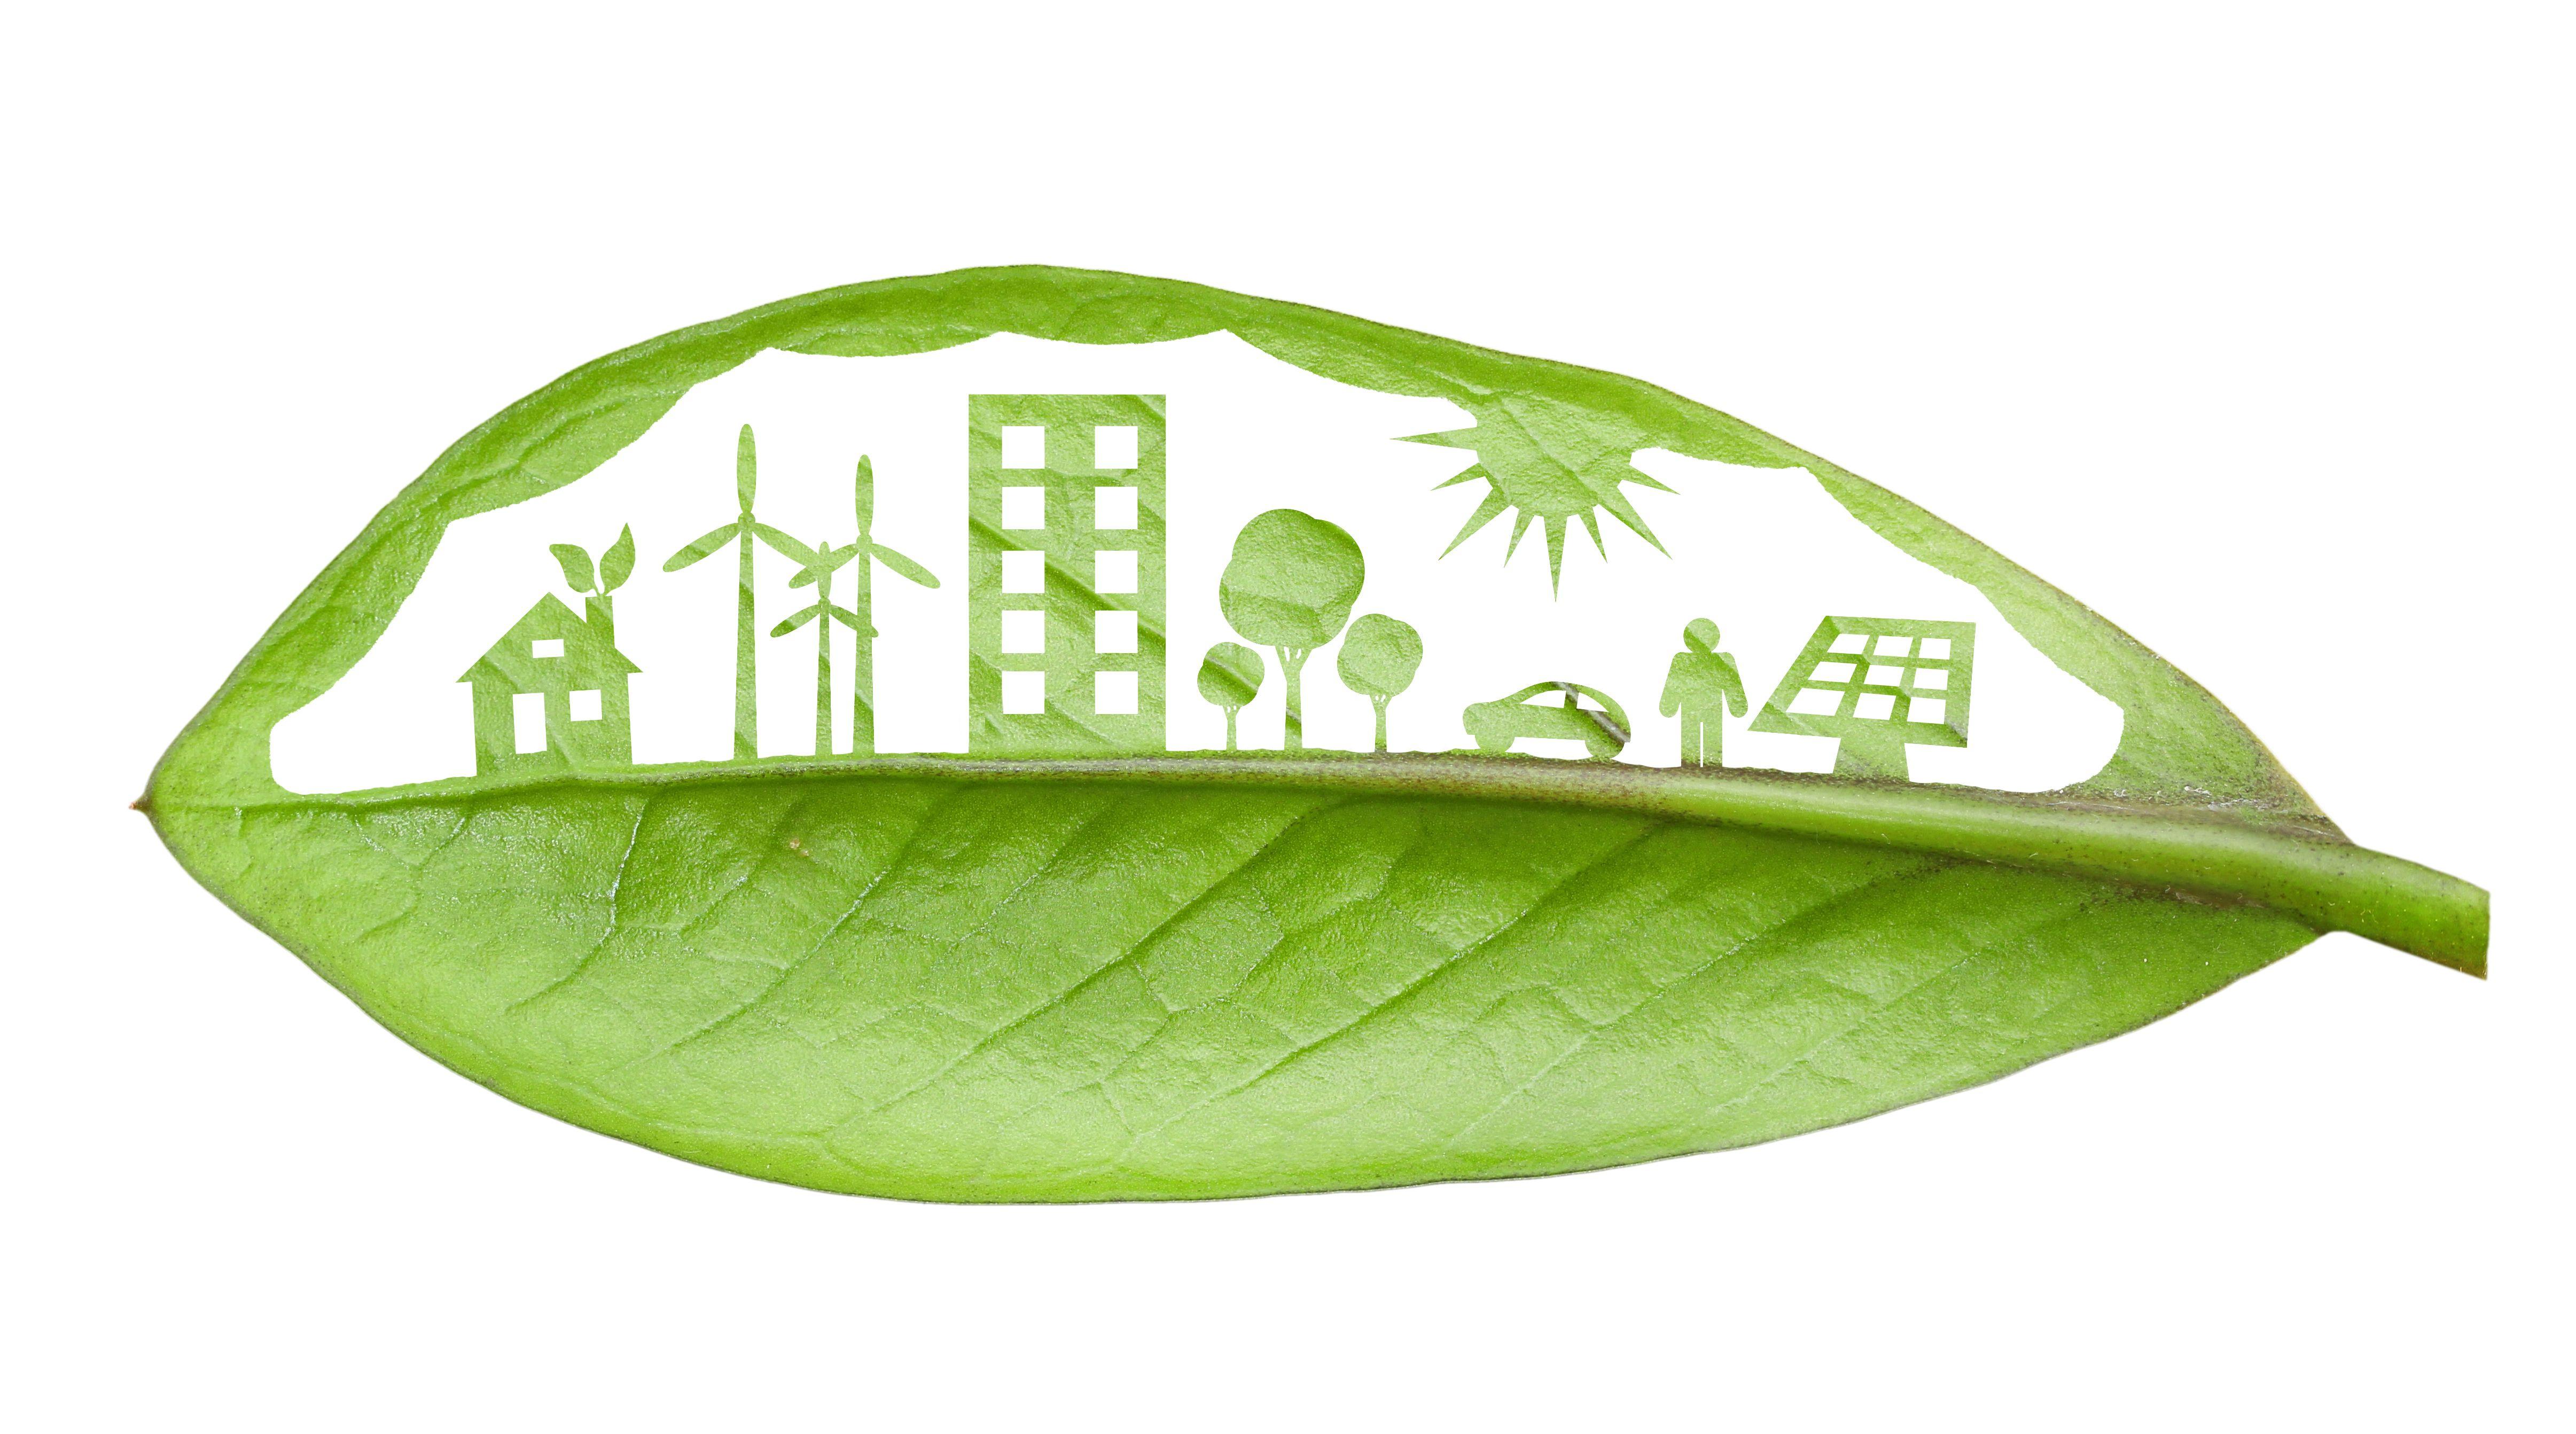 10 Stunning Renewable Energy Facts